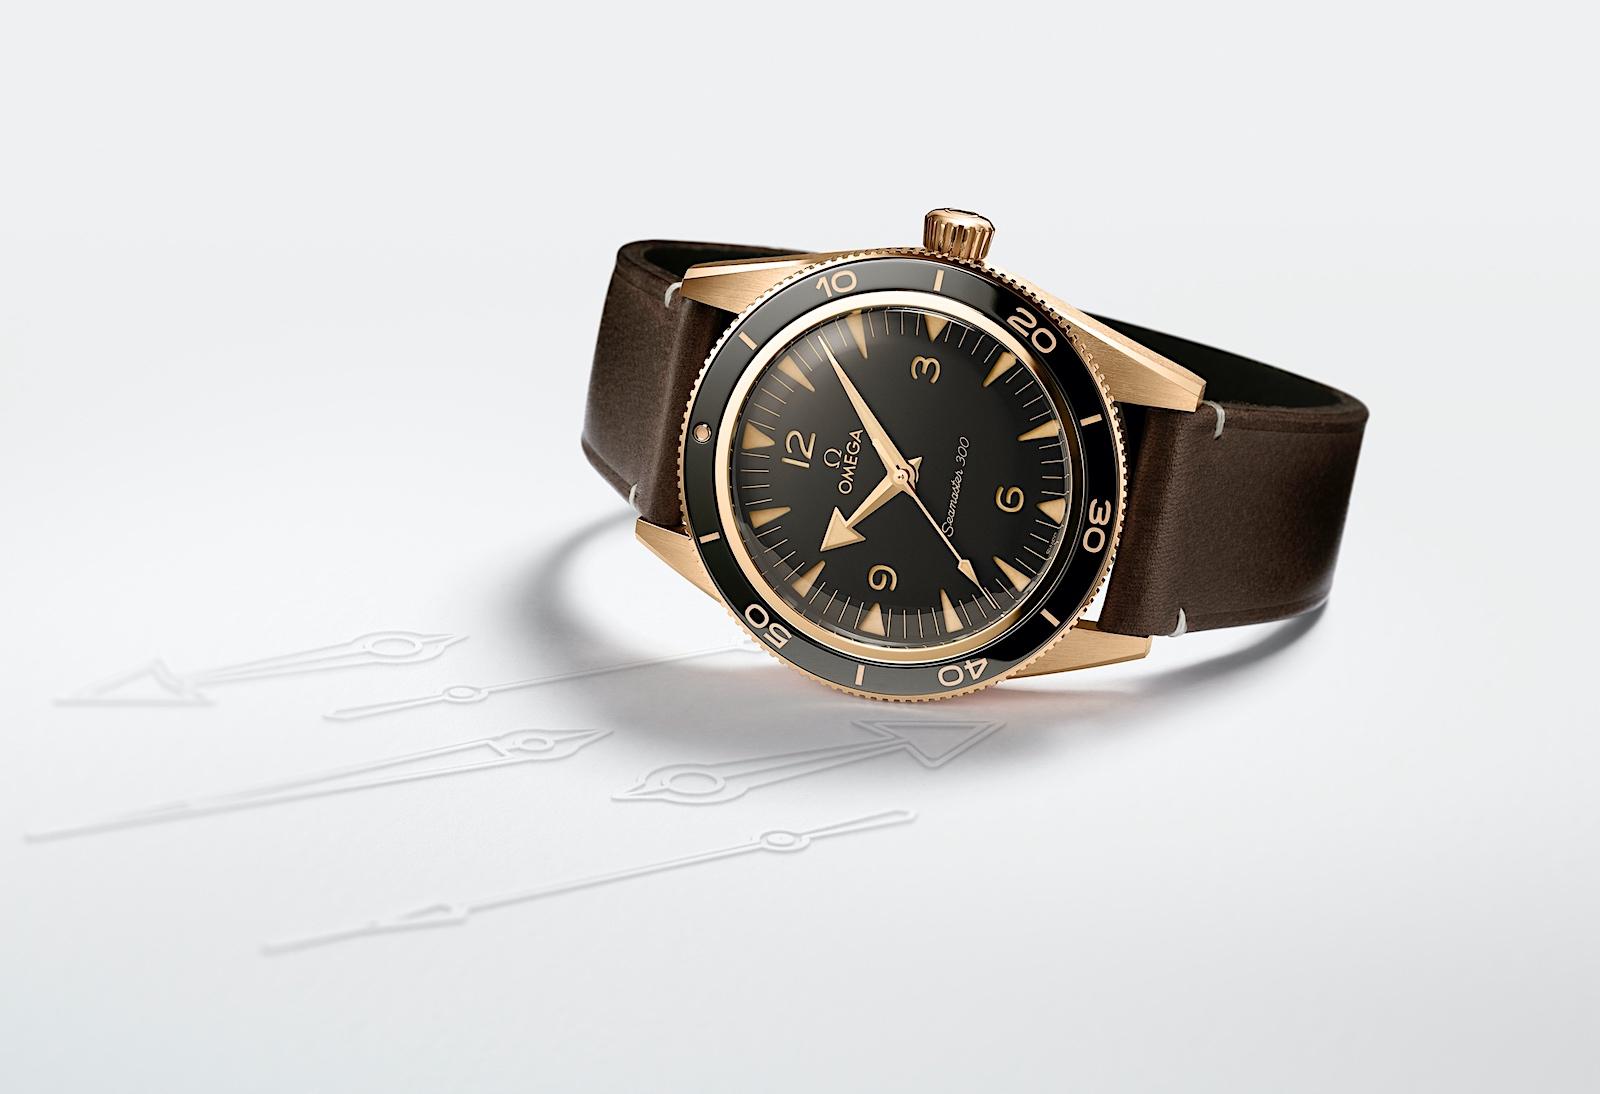 Las novedades 2021 de Omega - Seamaster 300 bronze gold